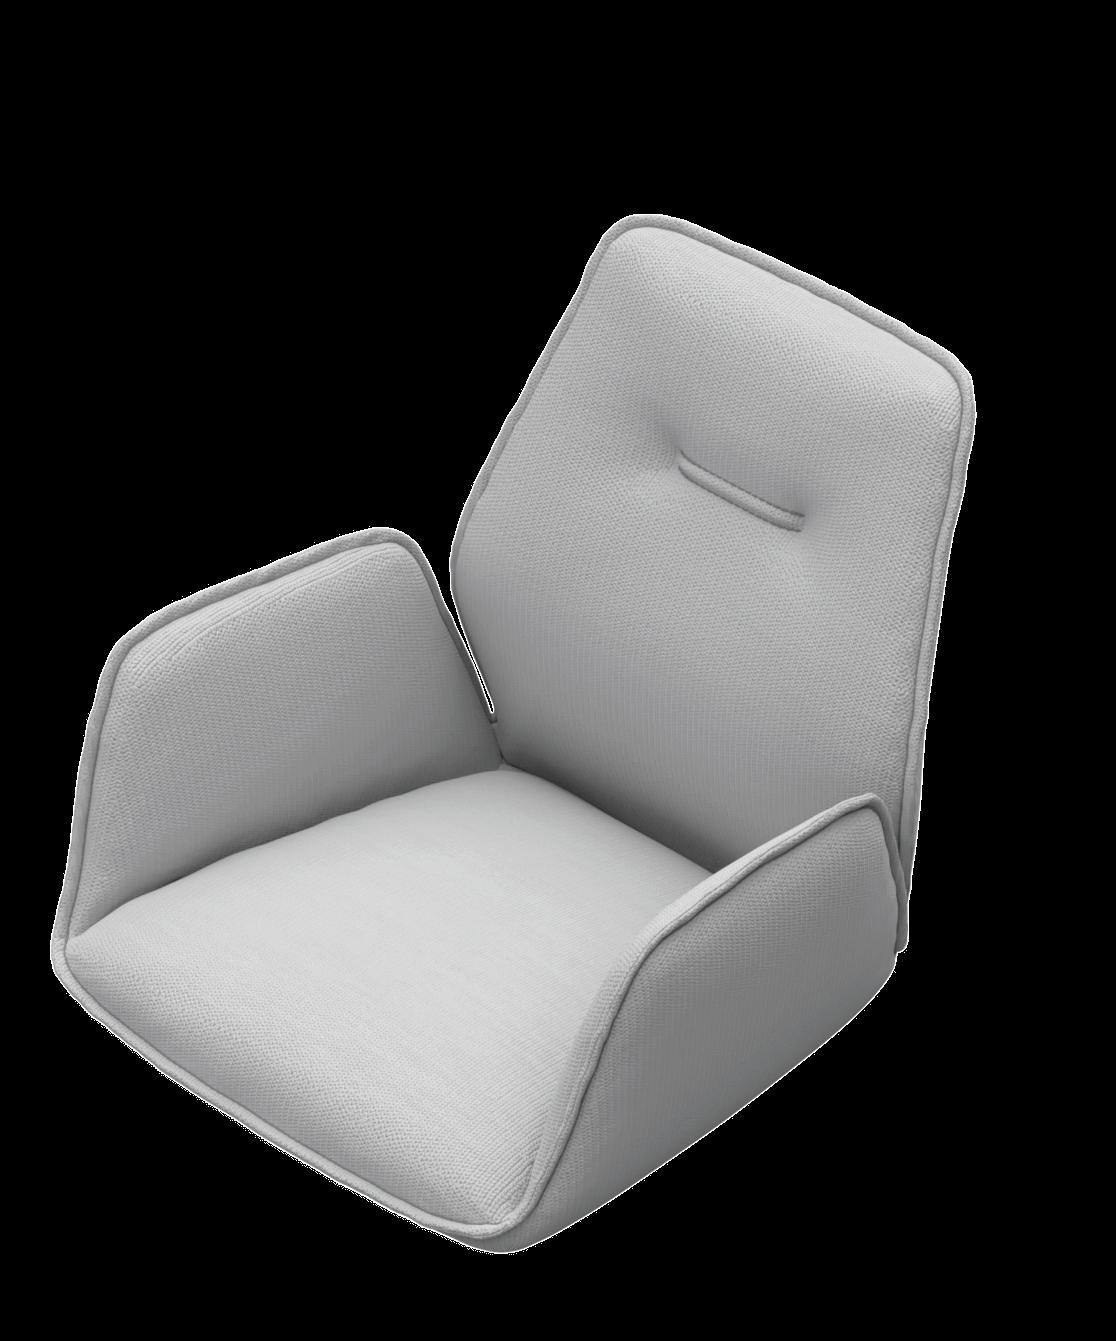 Sitzschale Zoa